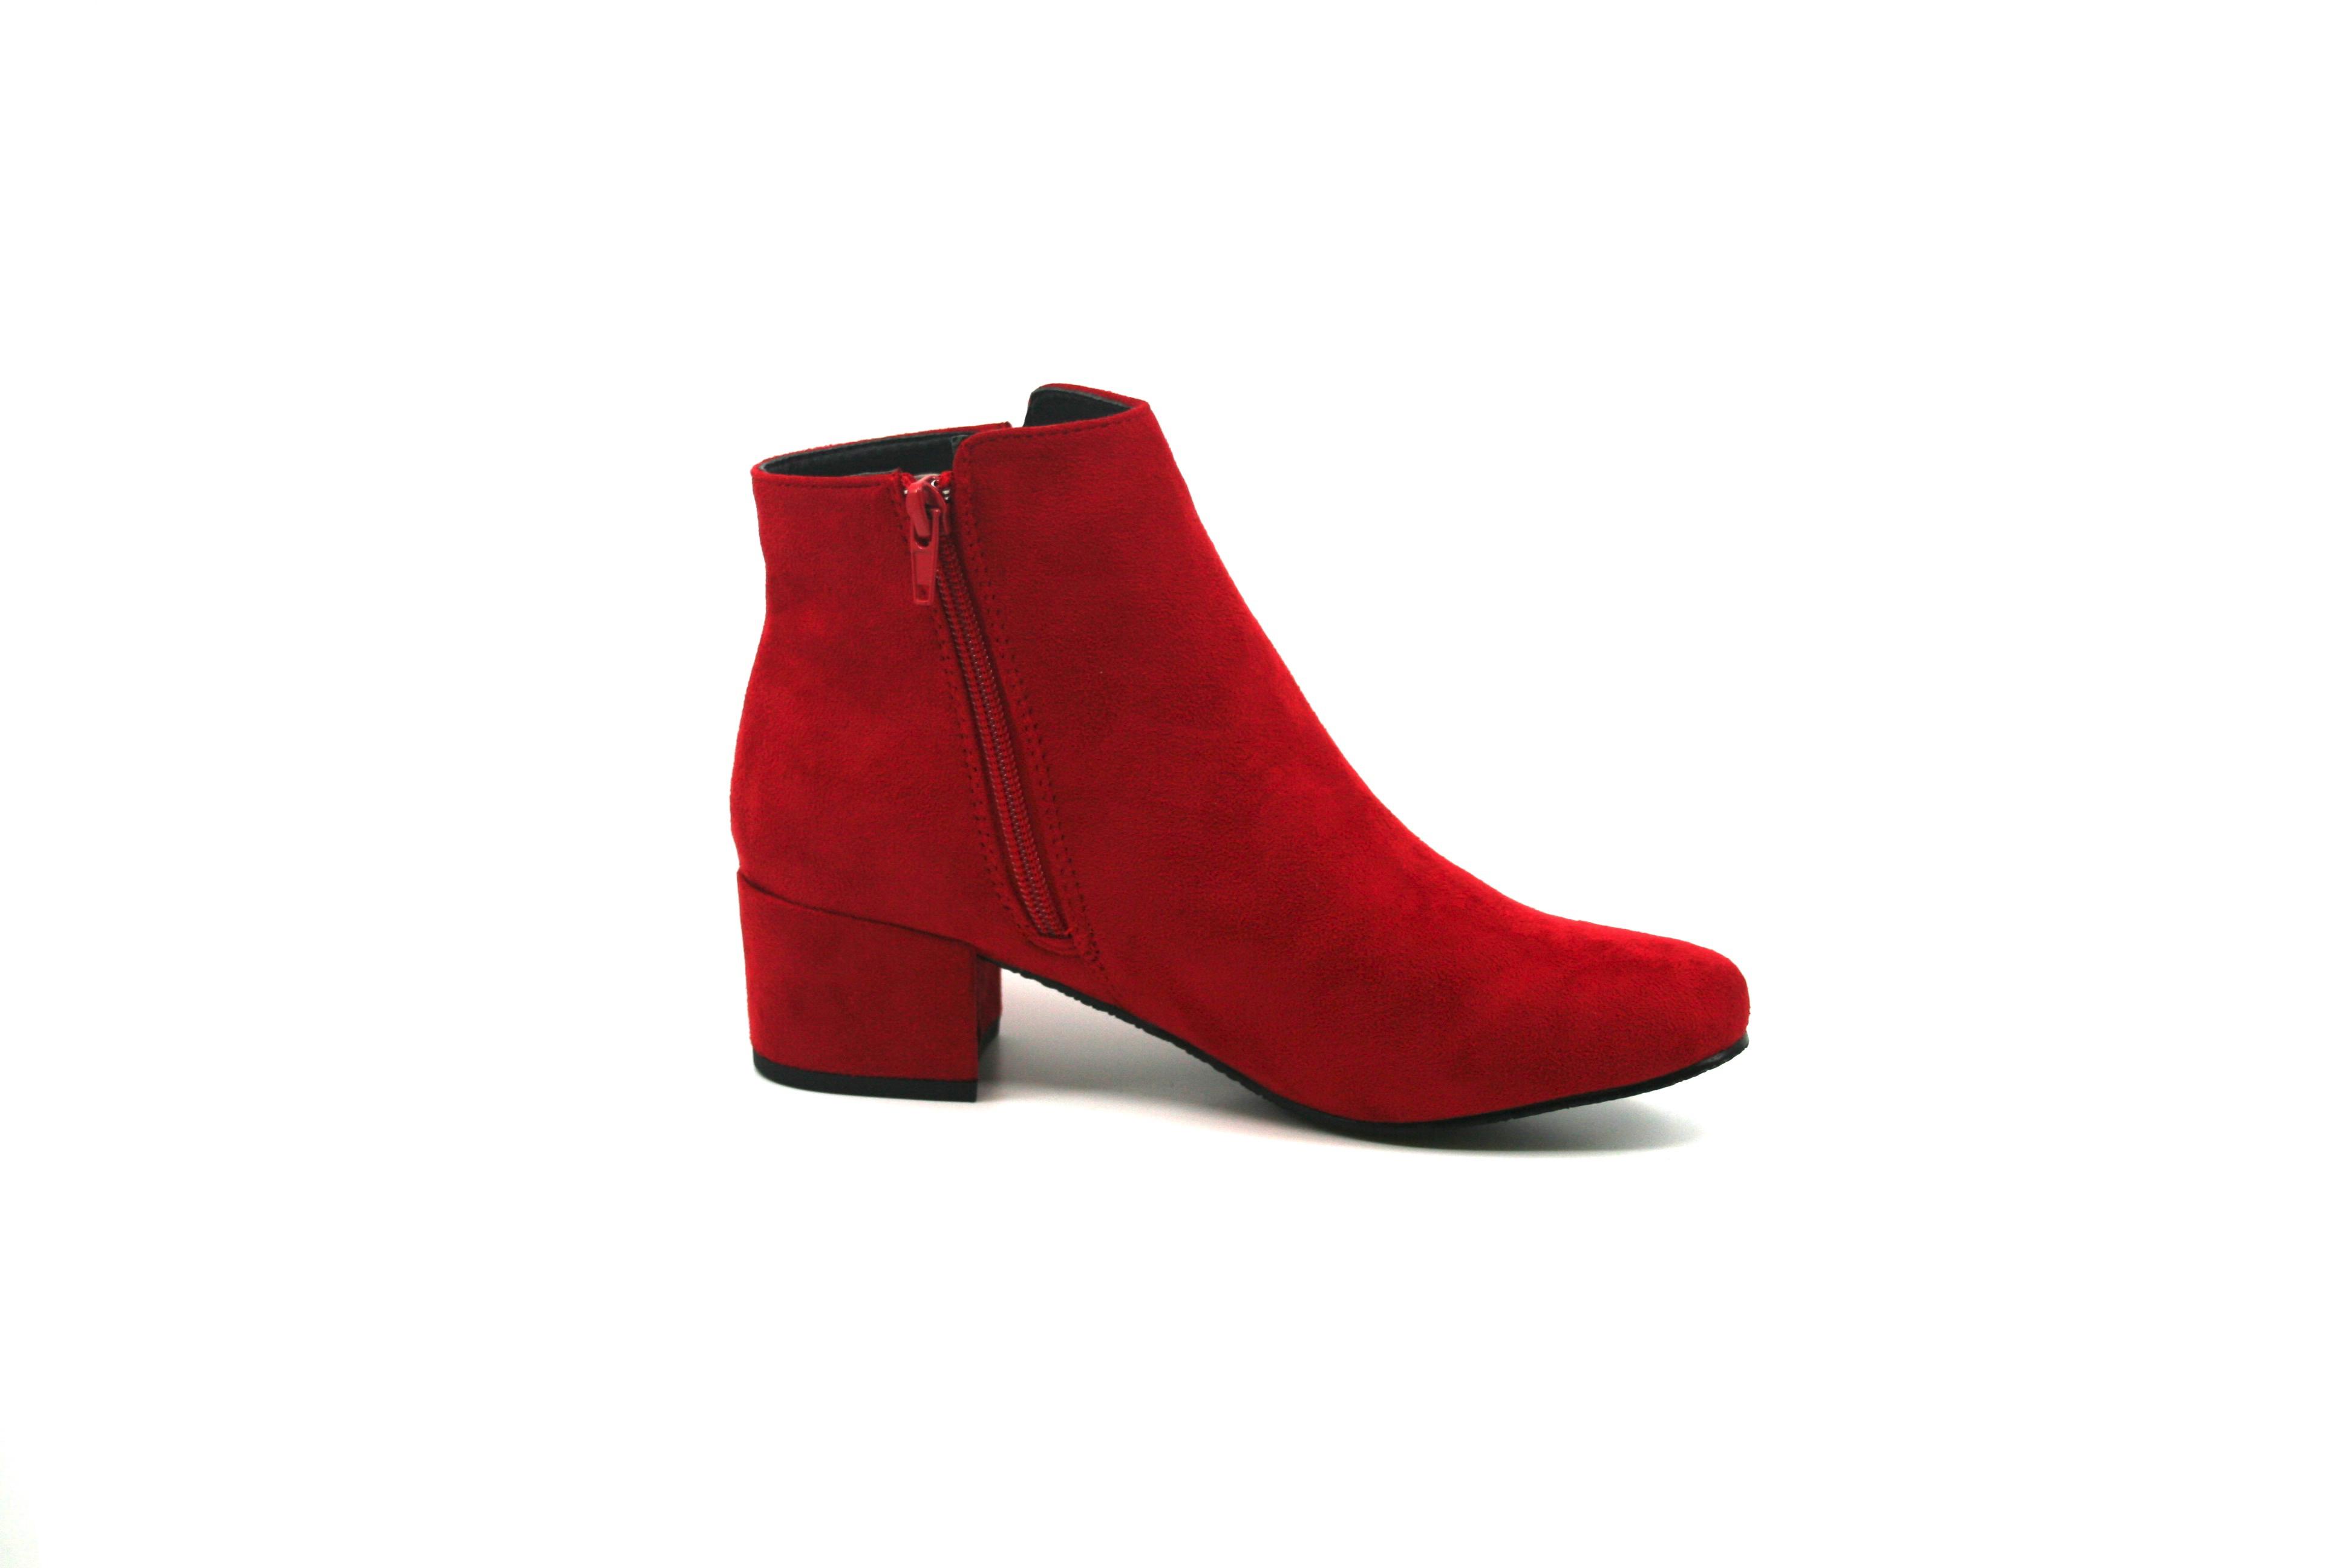 31a6e7c42b48 Damkjaer Sko Online Shop - Lækker støvle fra Duffy - 97-25003 - rød